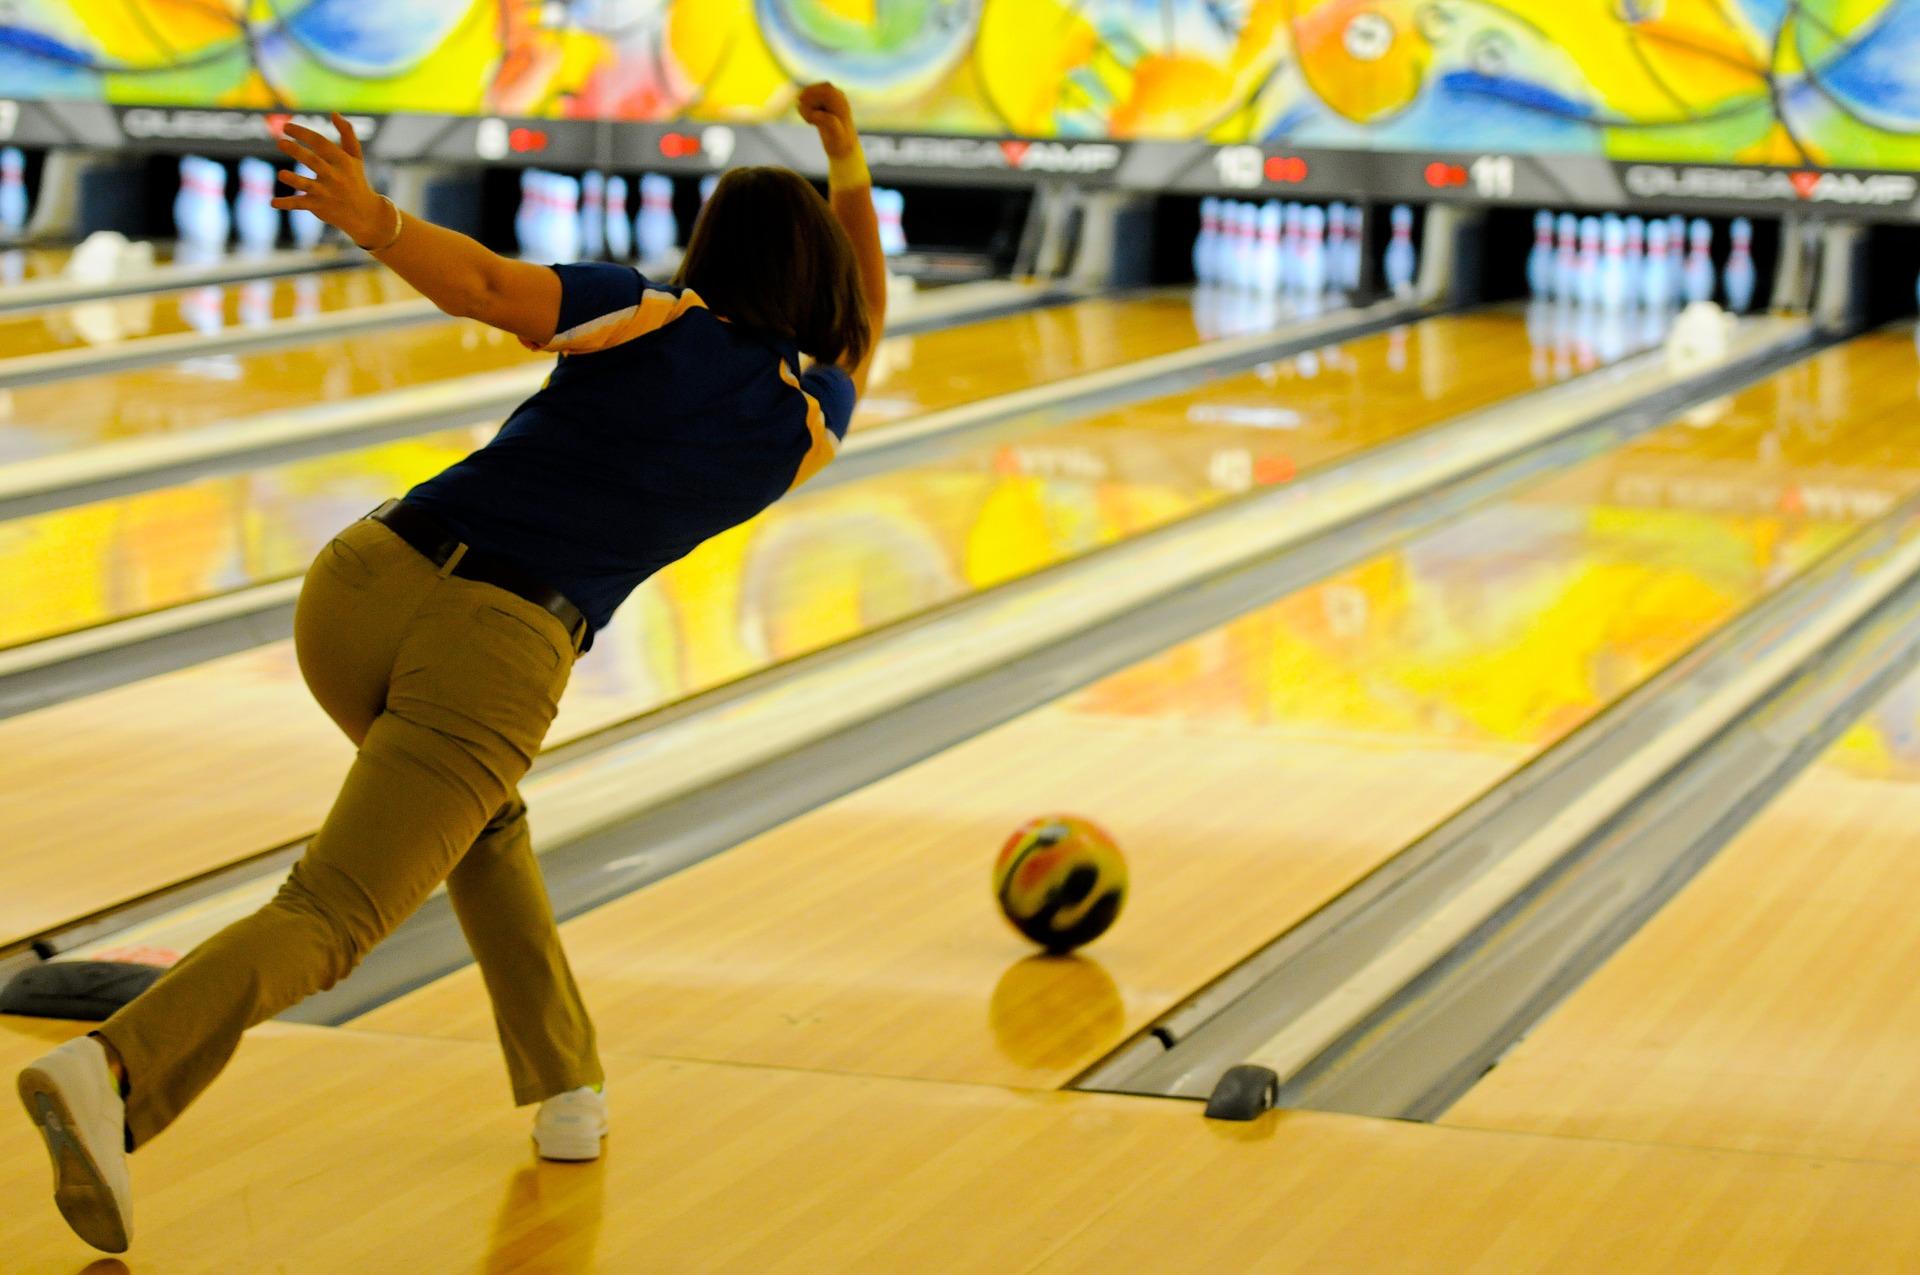 bowling-696132_1920.jpg